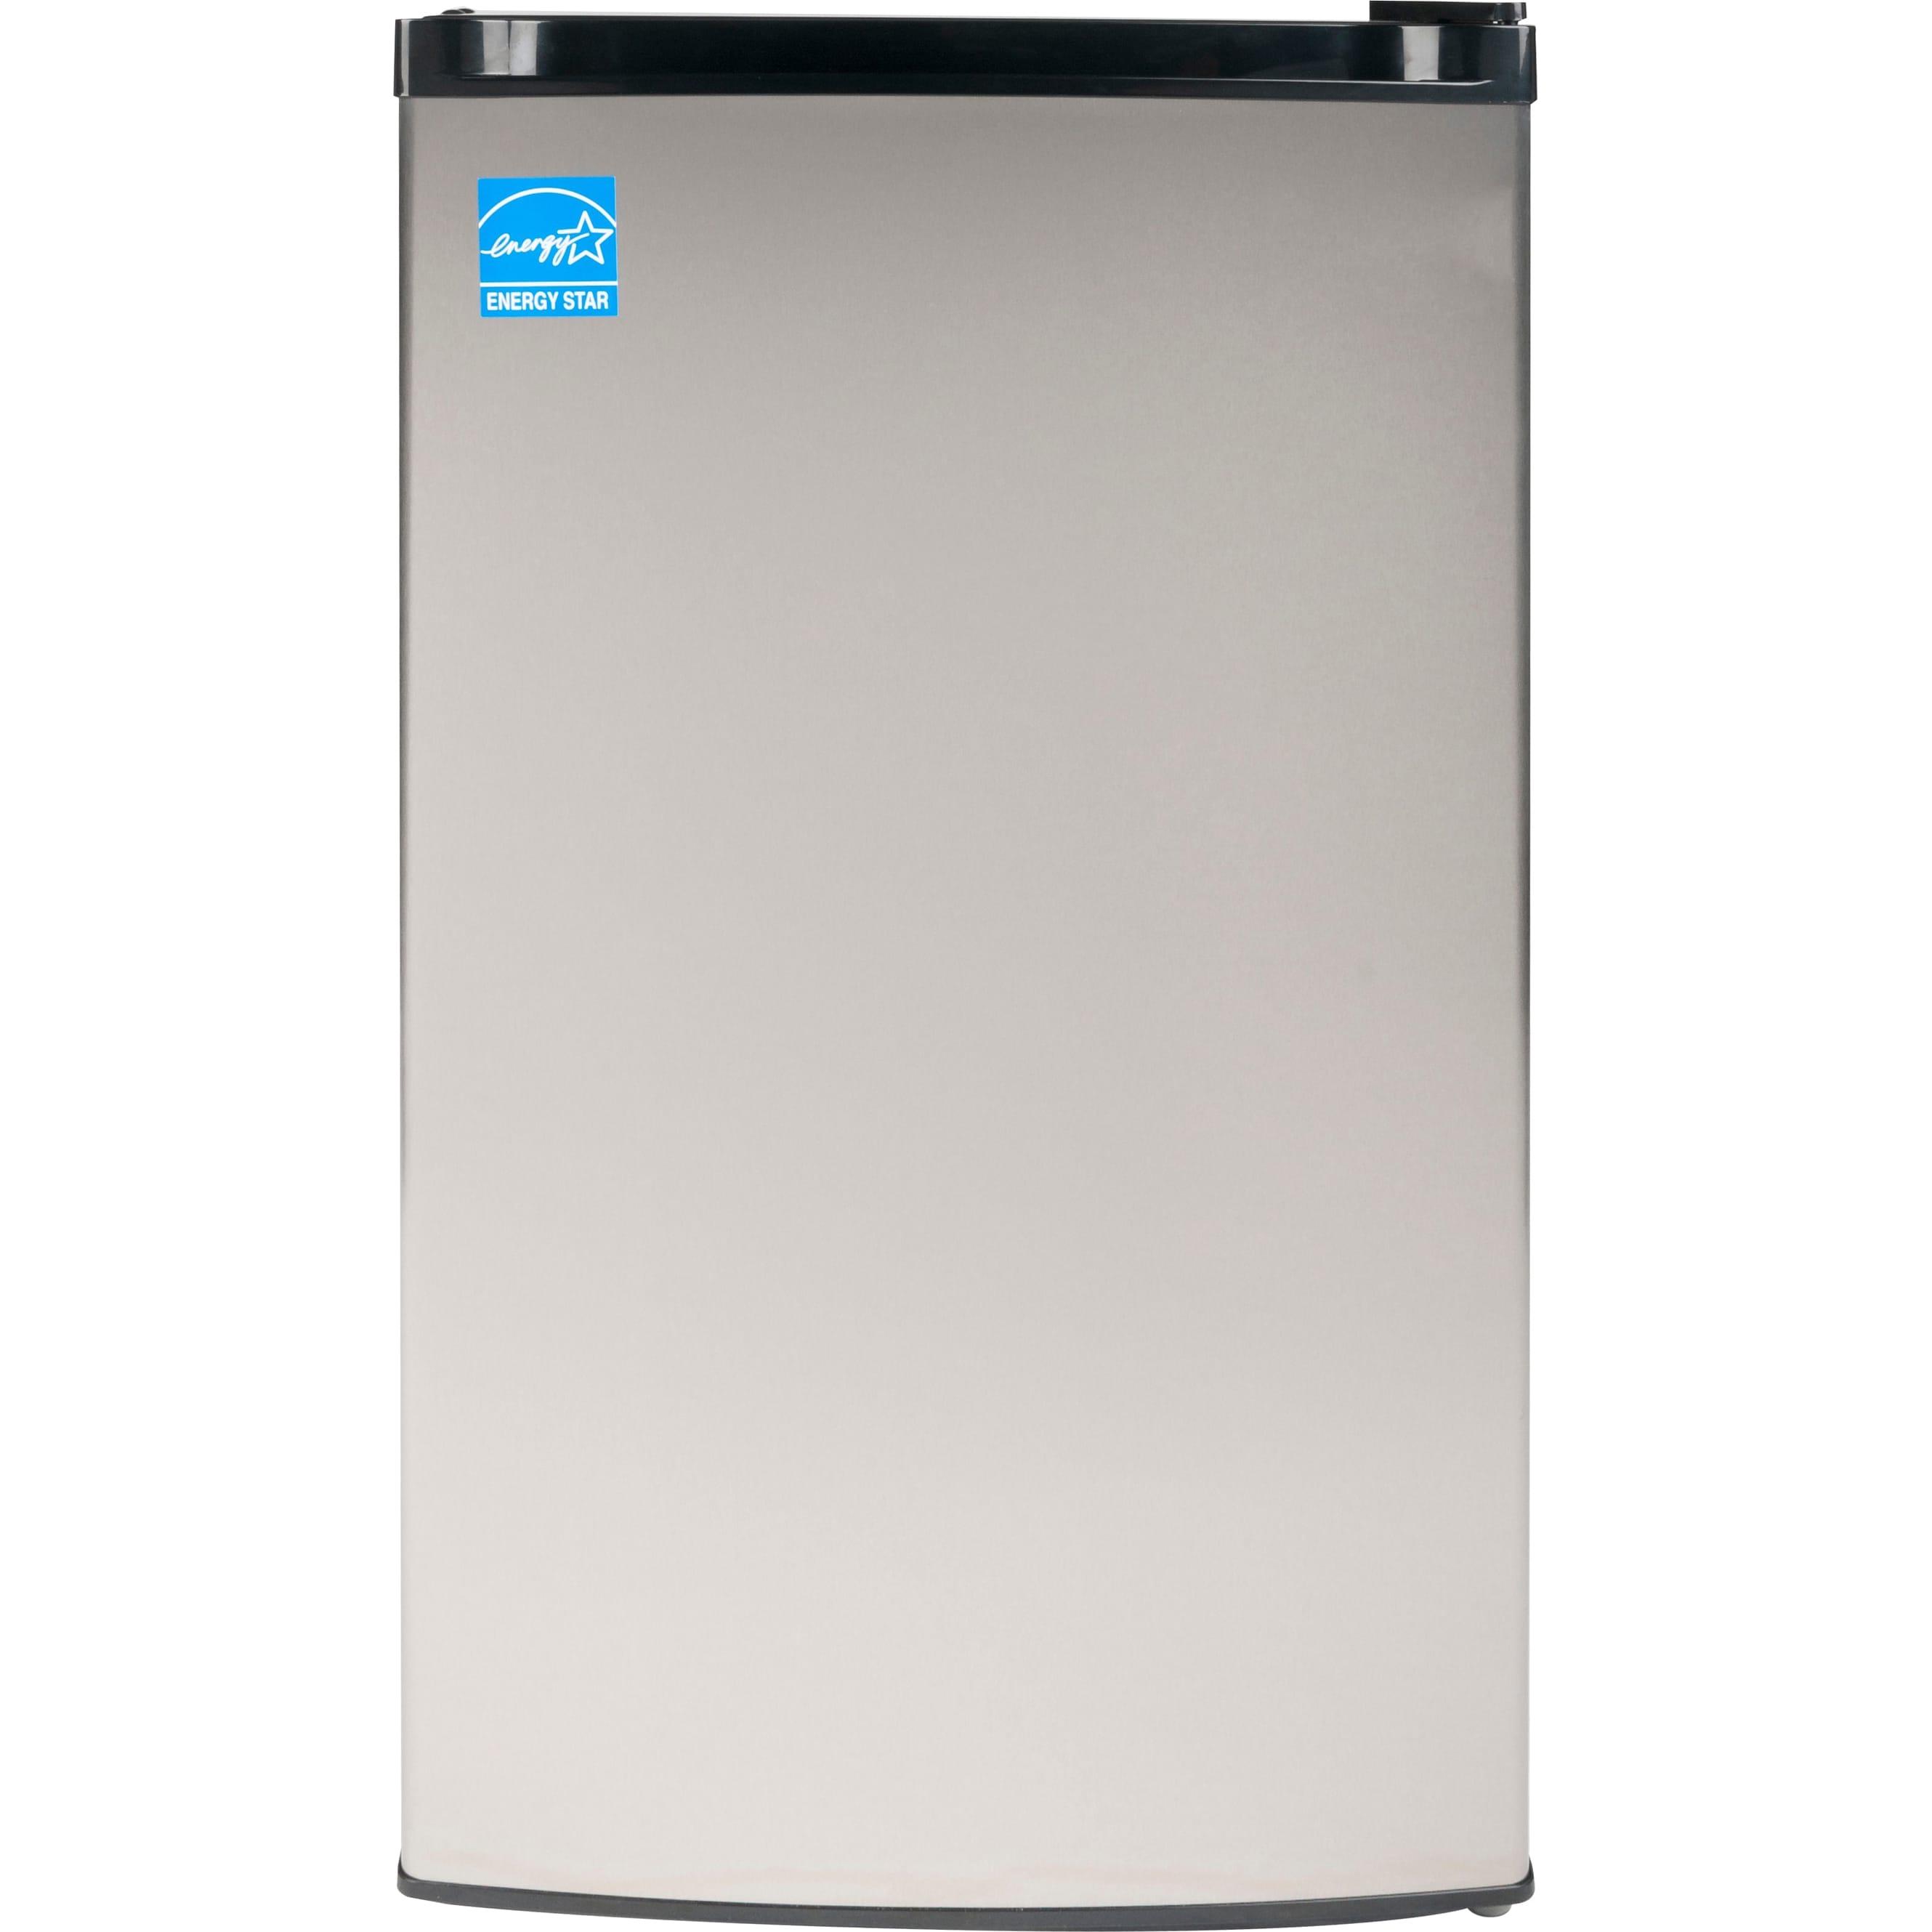 Equator-Midea 3 Cu. Ft. Upright Stainless Steel Freezer (...